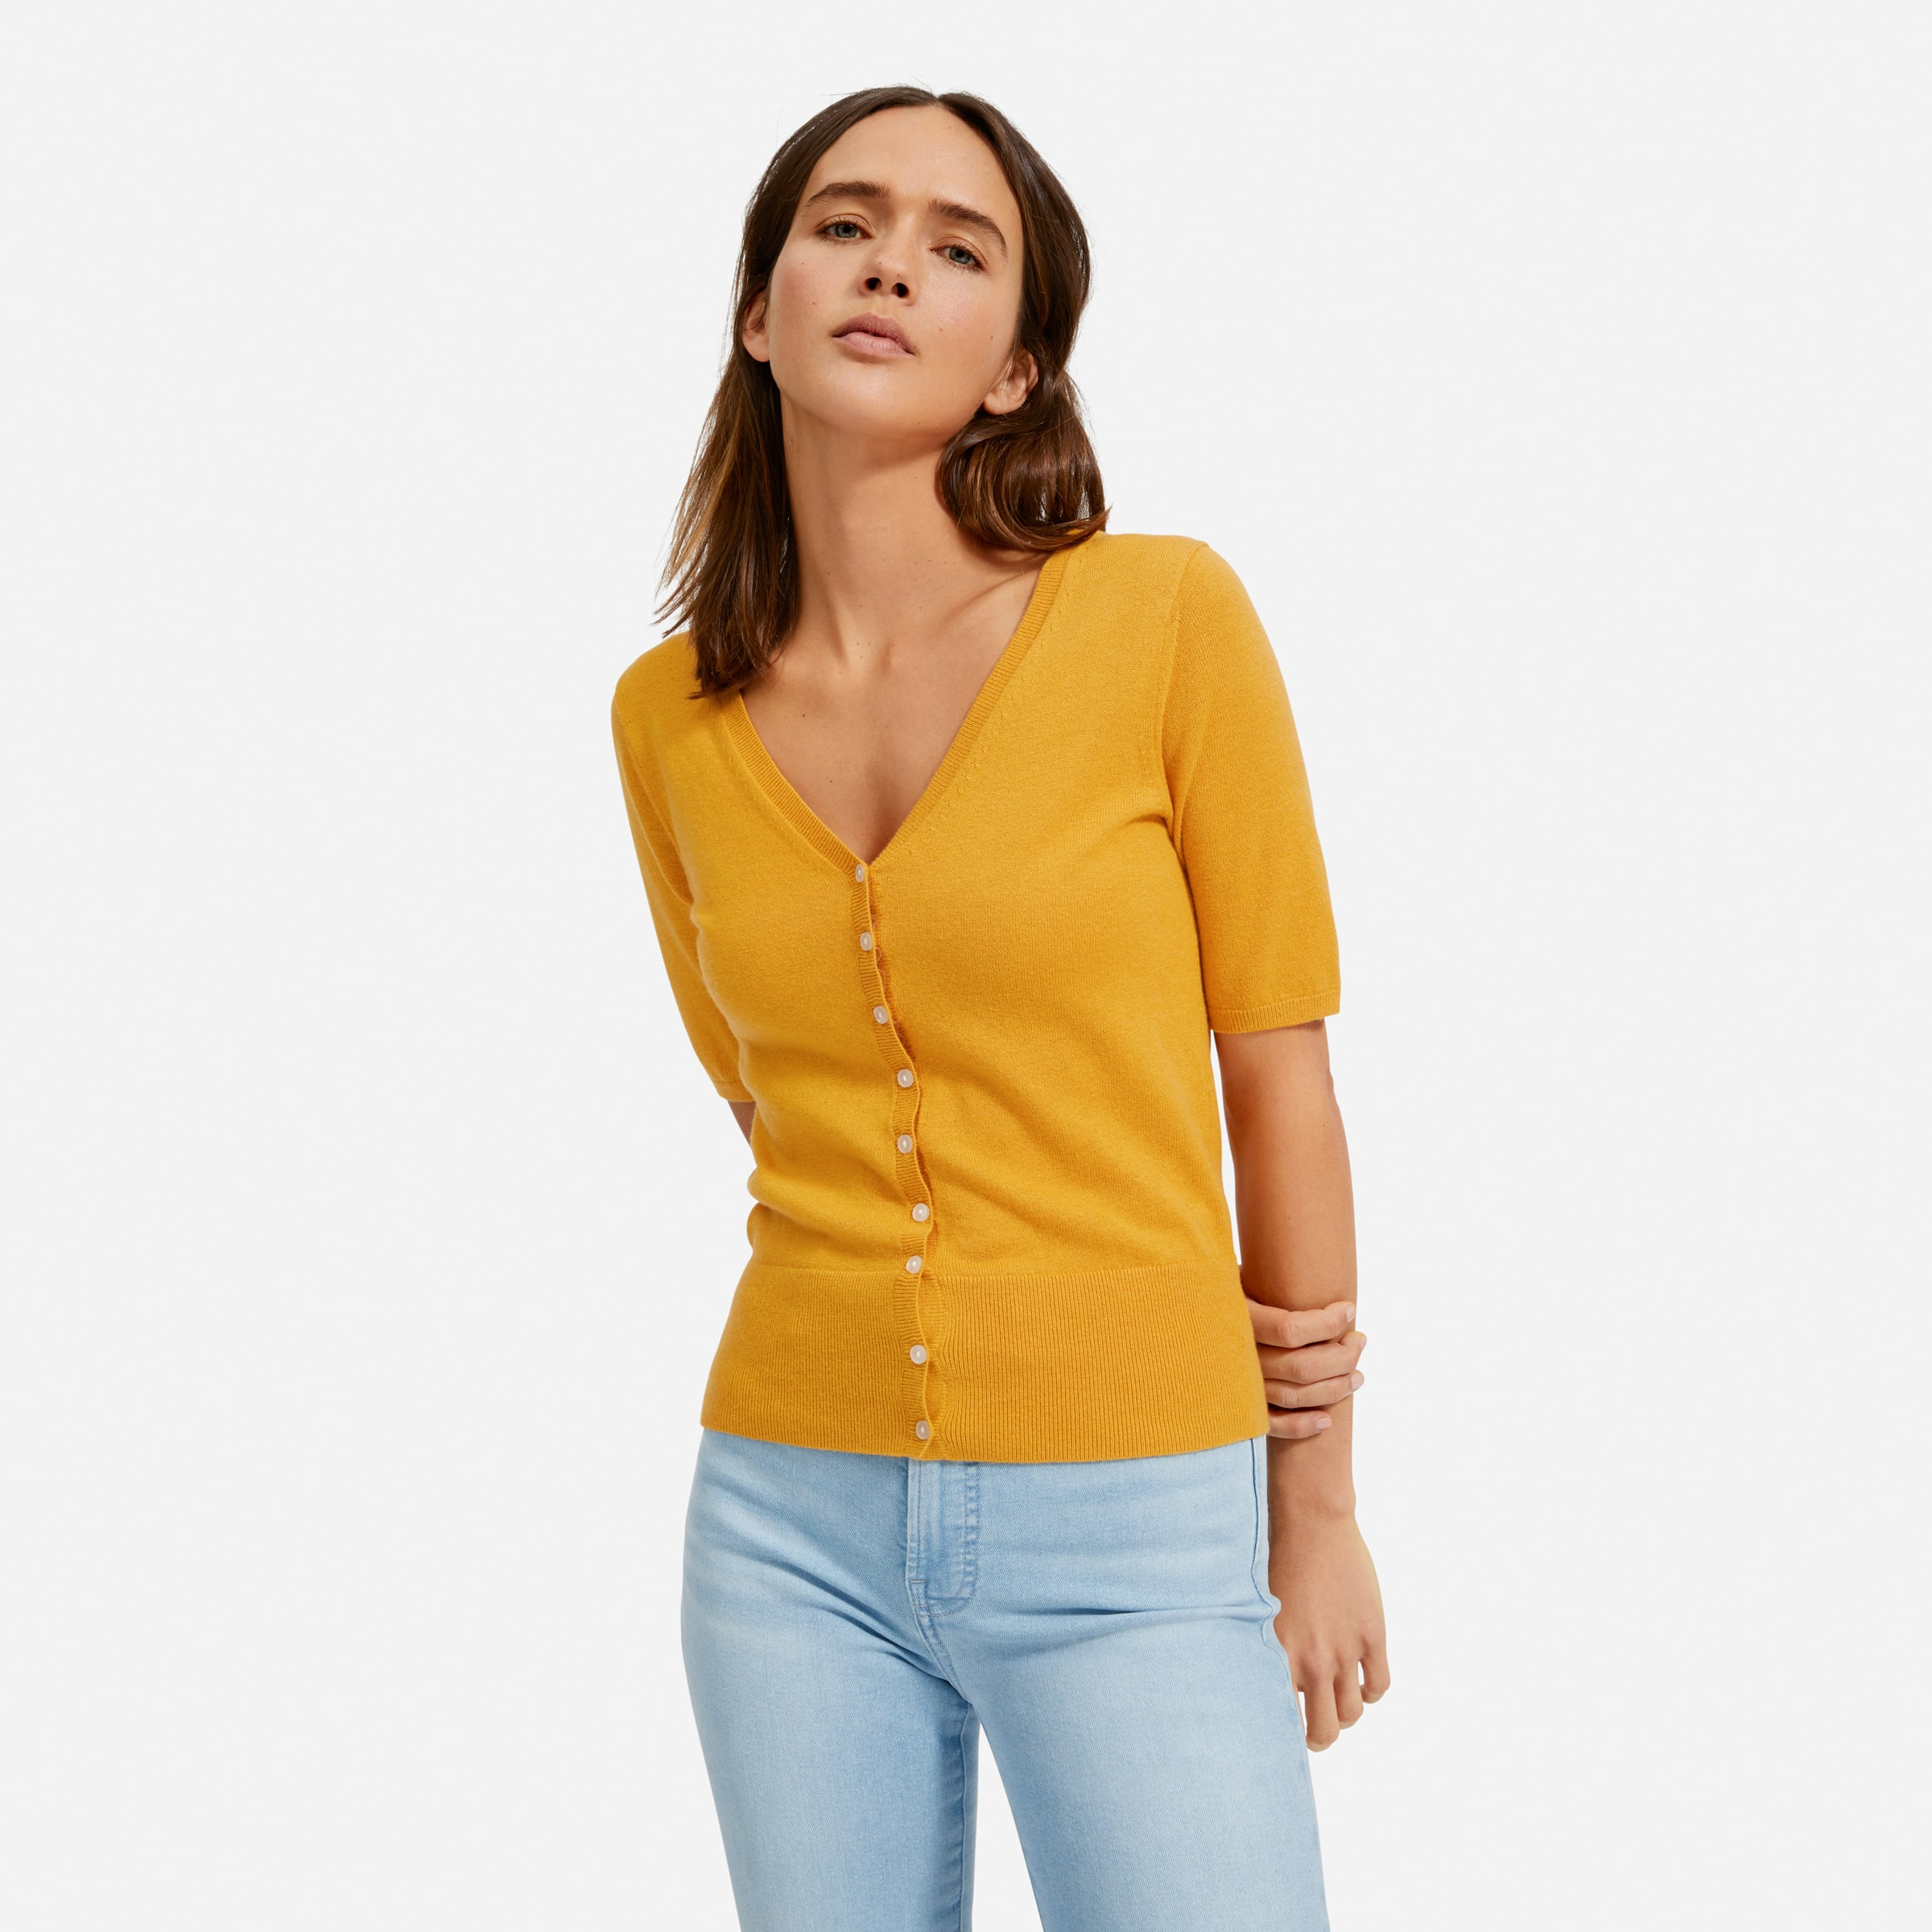 The Cotton Merino Short Sleeve Cardigan Everlane